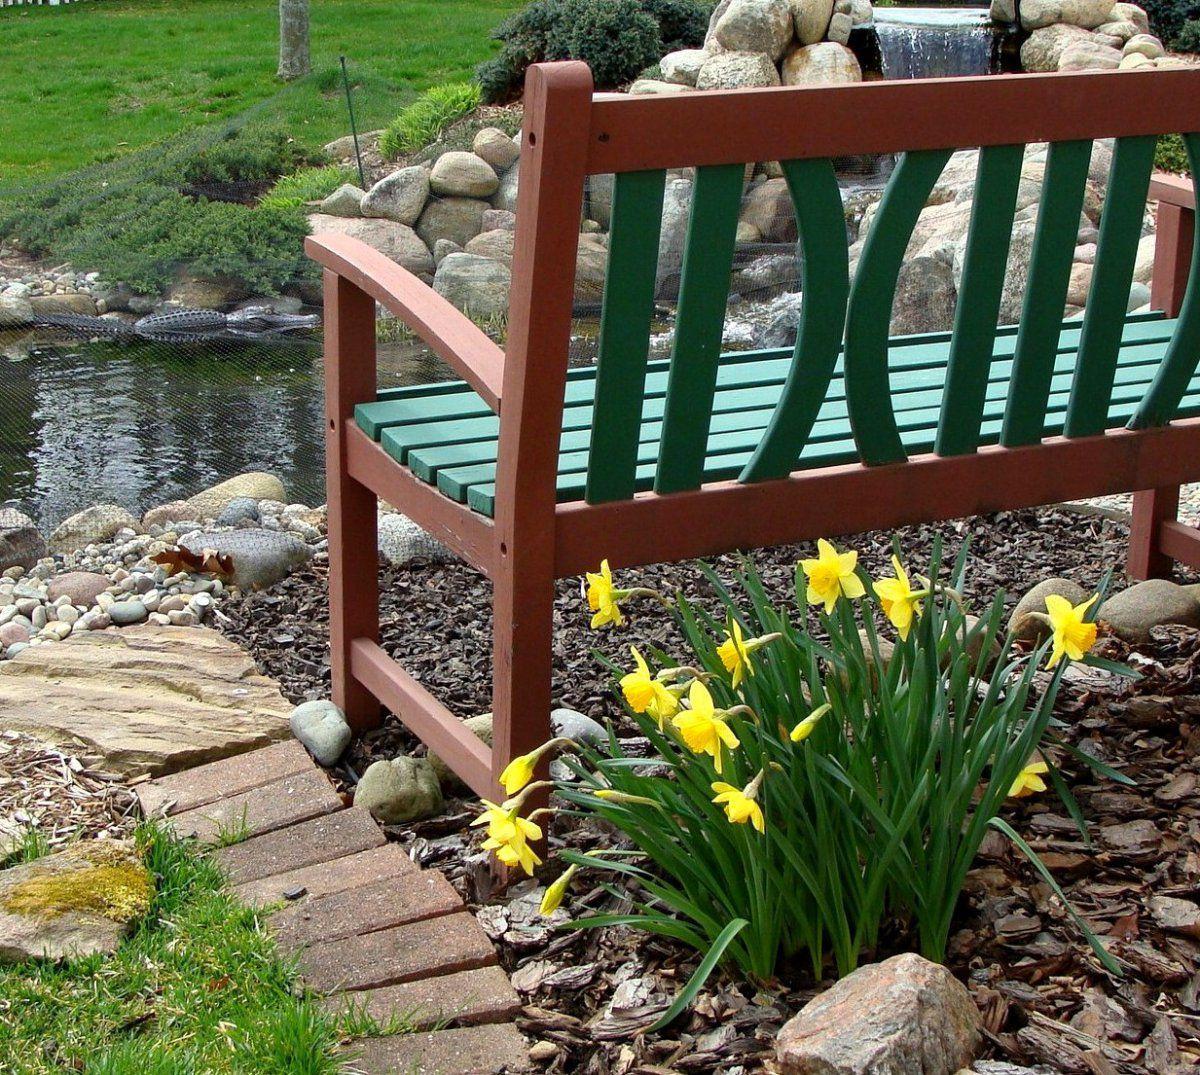 daffodils 2016-3-24 (2).JPG